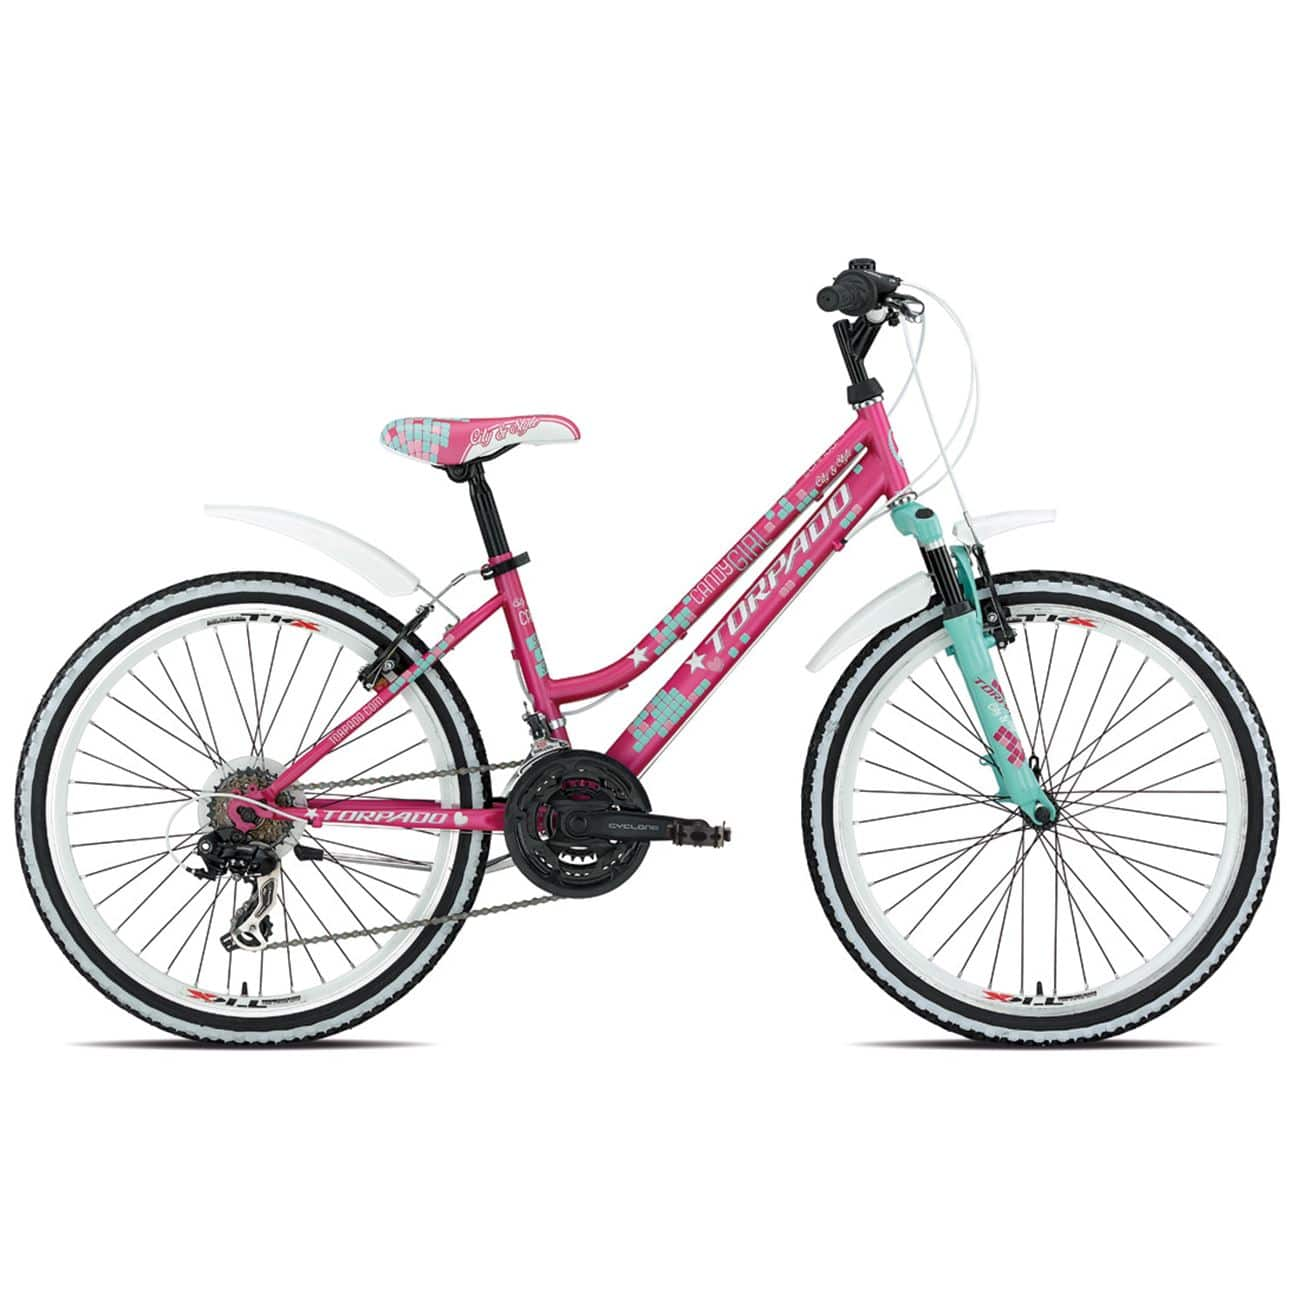 "Torpado Candy 24"" - Παιδικό Ποδήλατο"